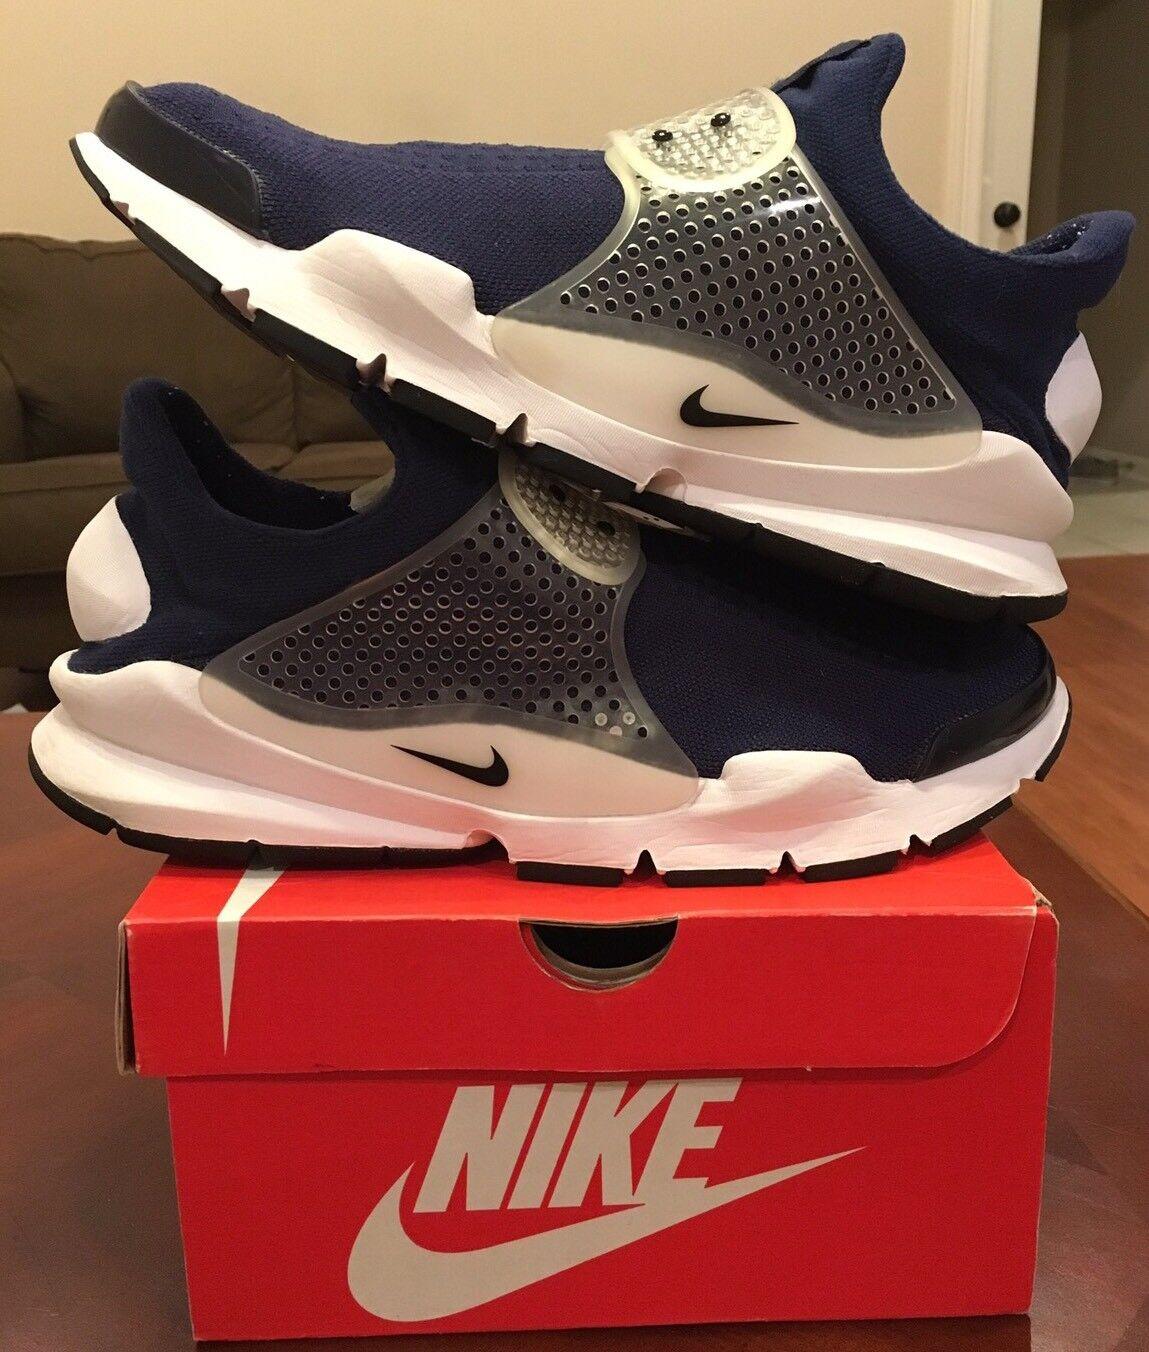 Nike Sock Dart Midnight Navy Framment Unisex Obsidian Boost  12 Jordan 1 2 7 12  migliore marca